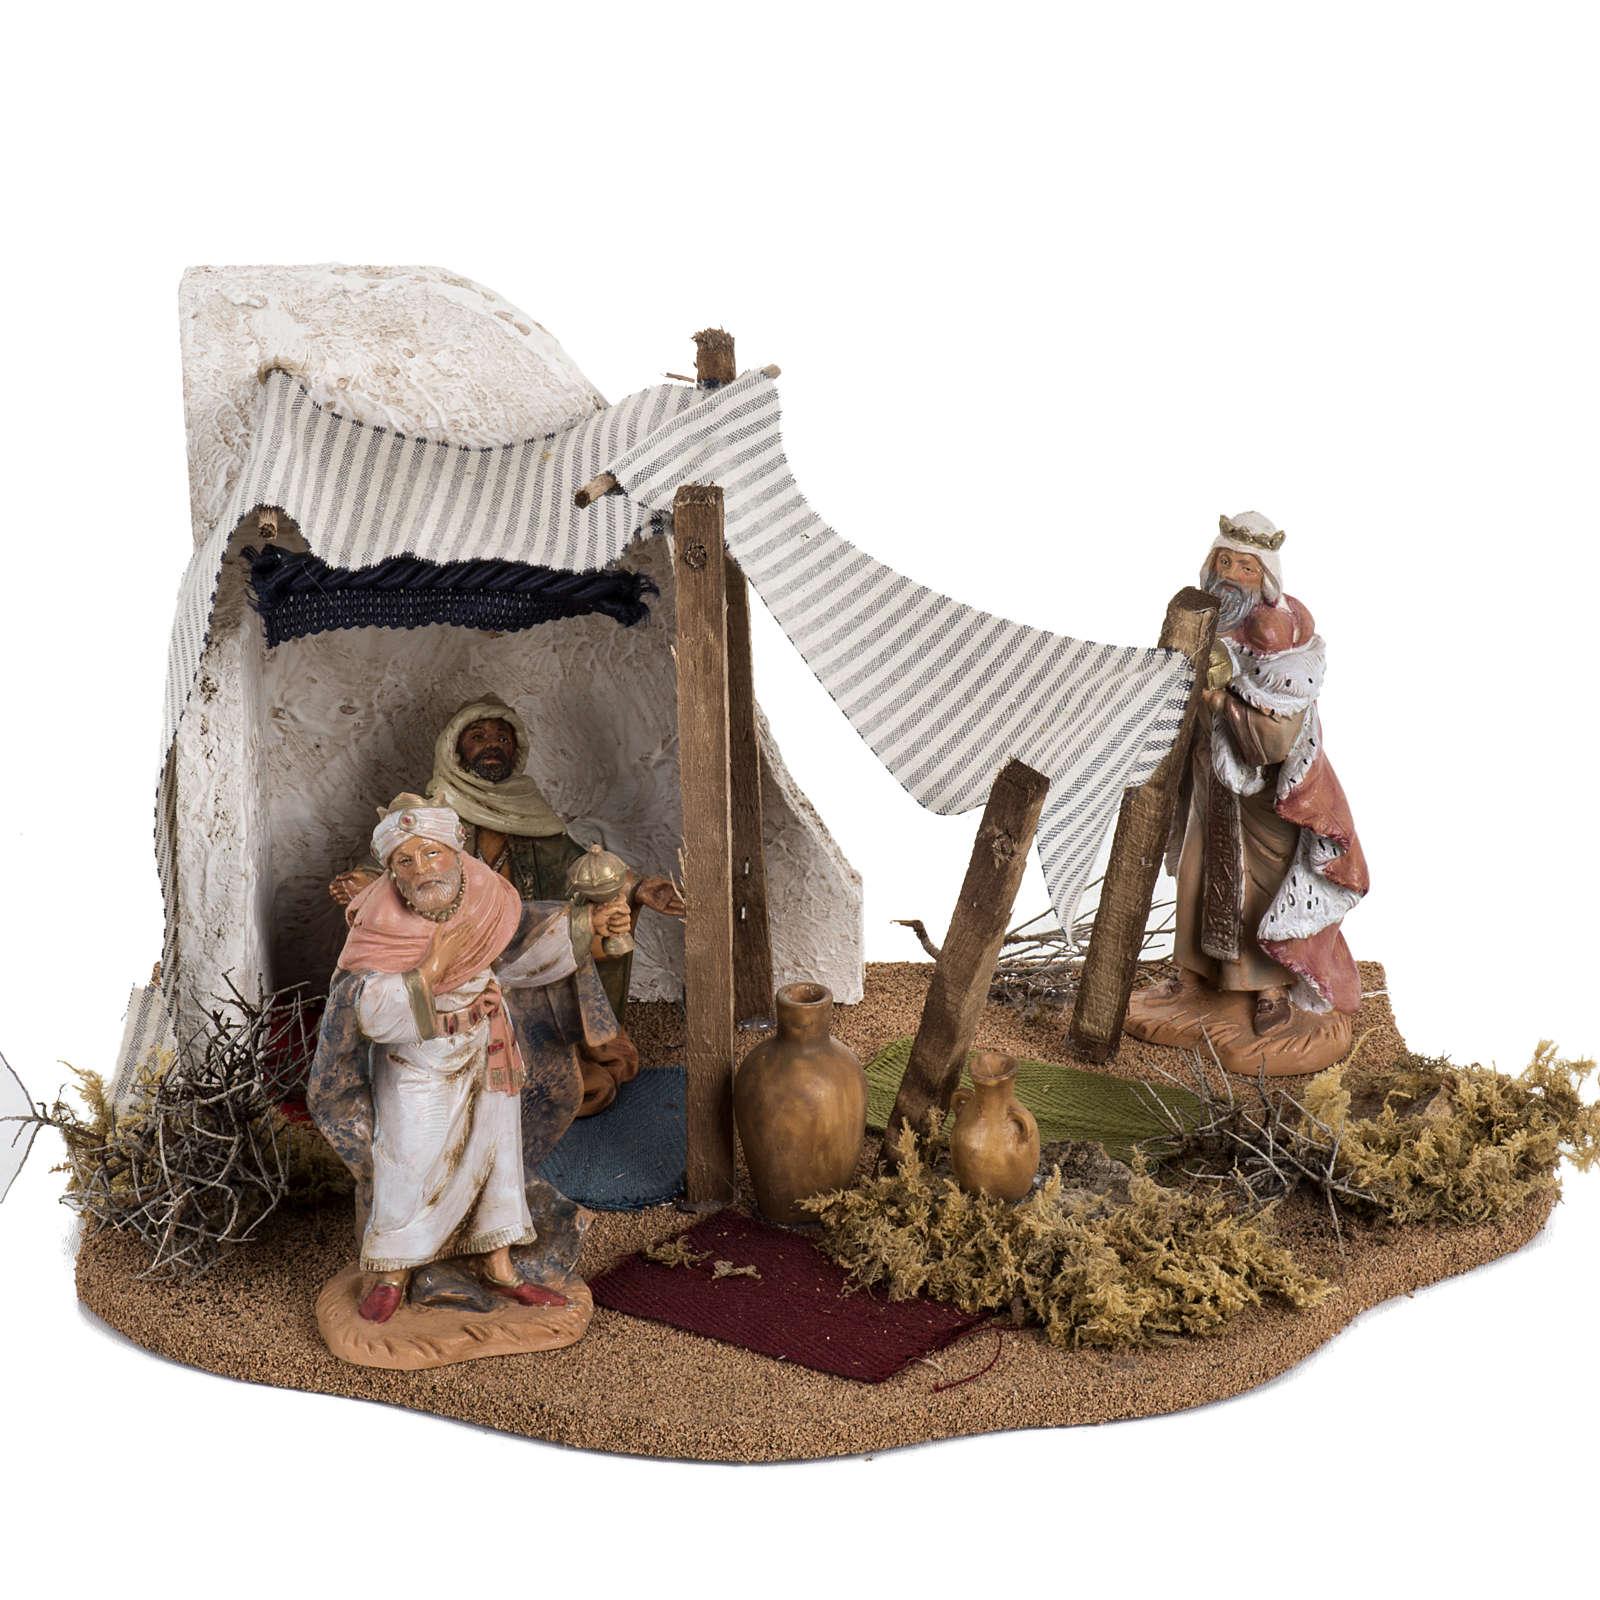 Holyart Fr Noel Decors Creche